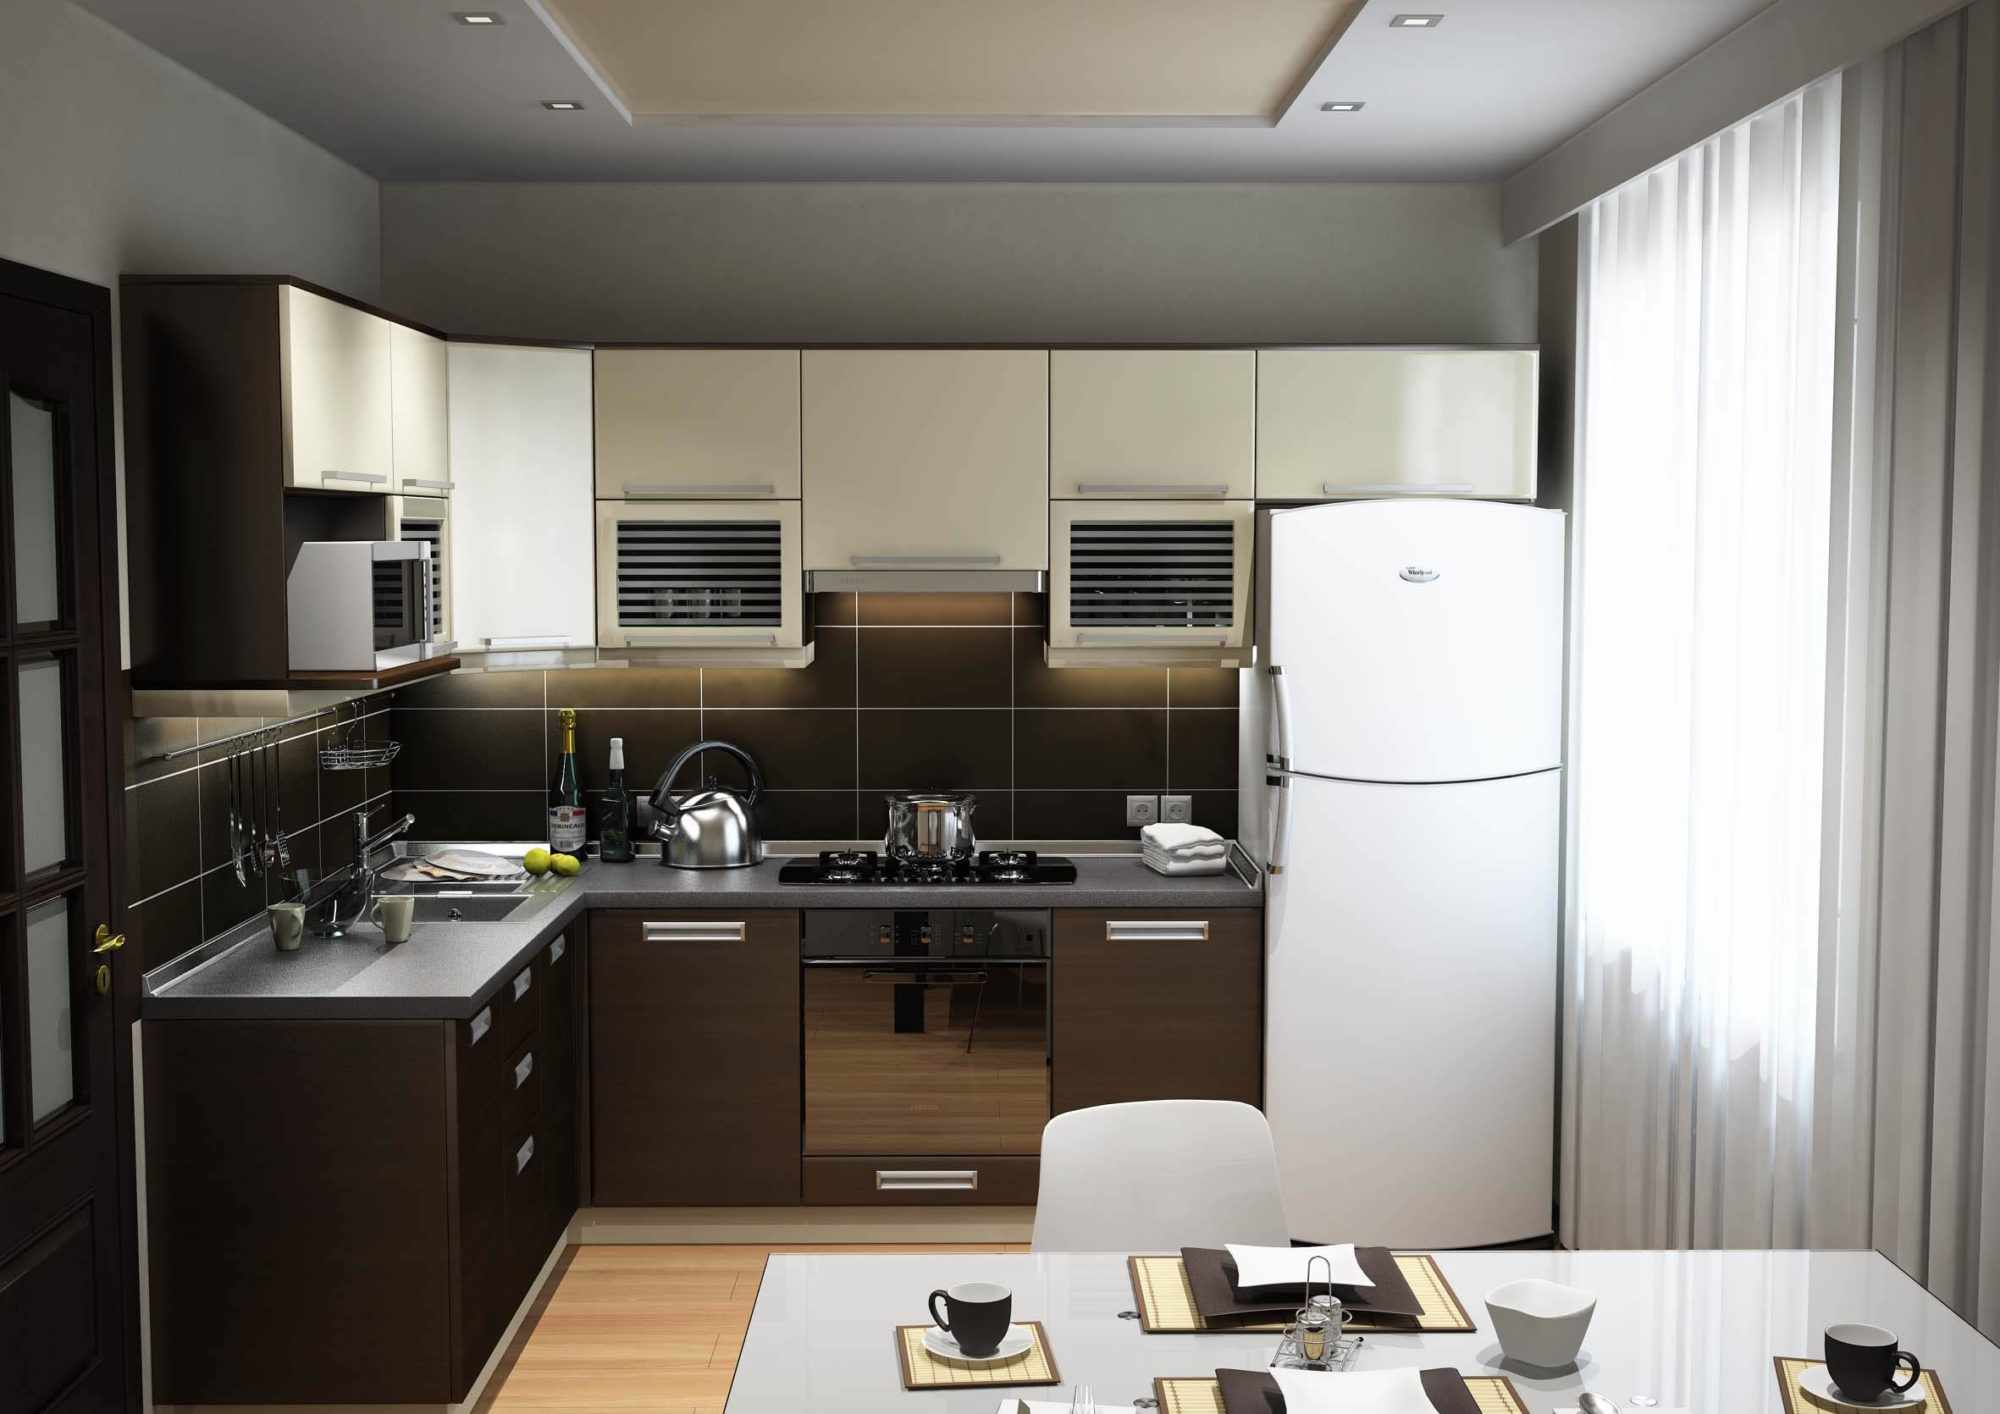 Холодильник у окна